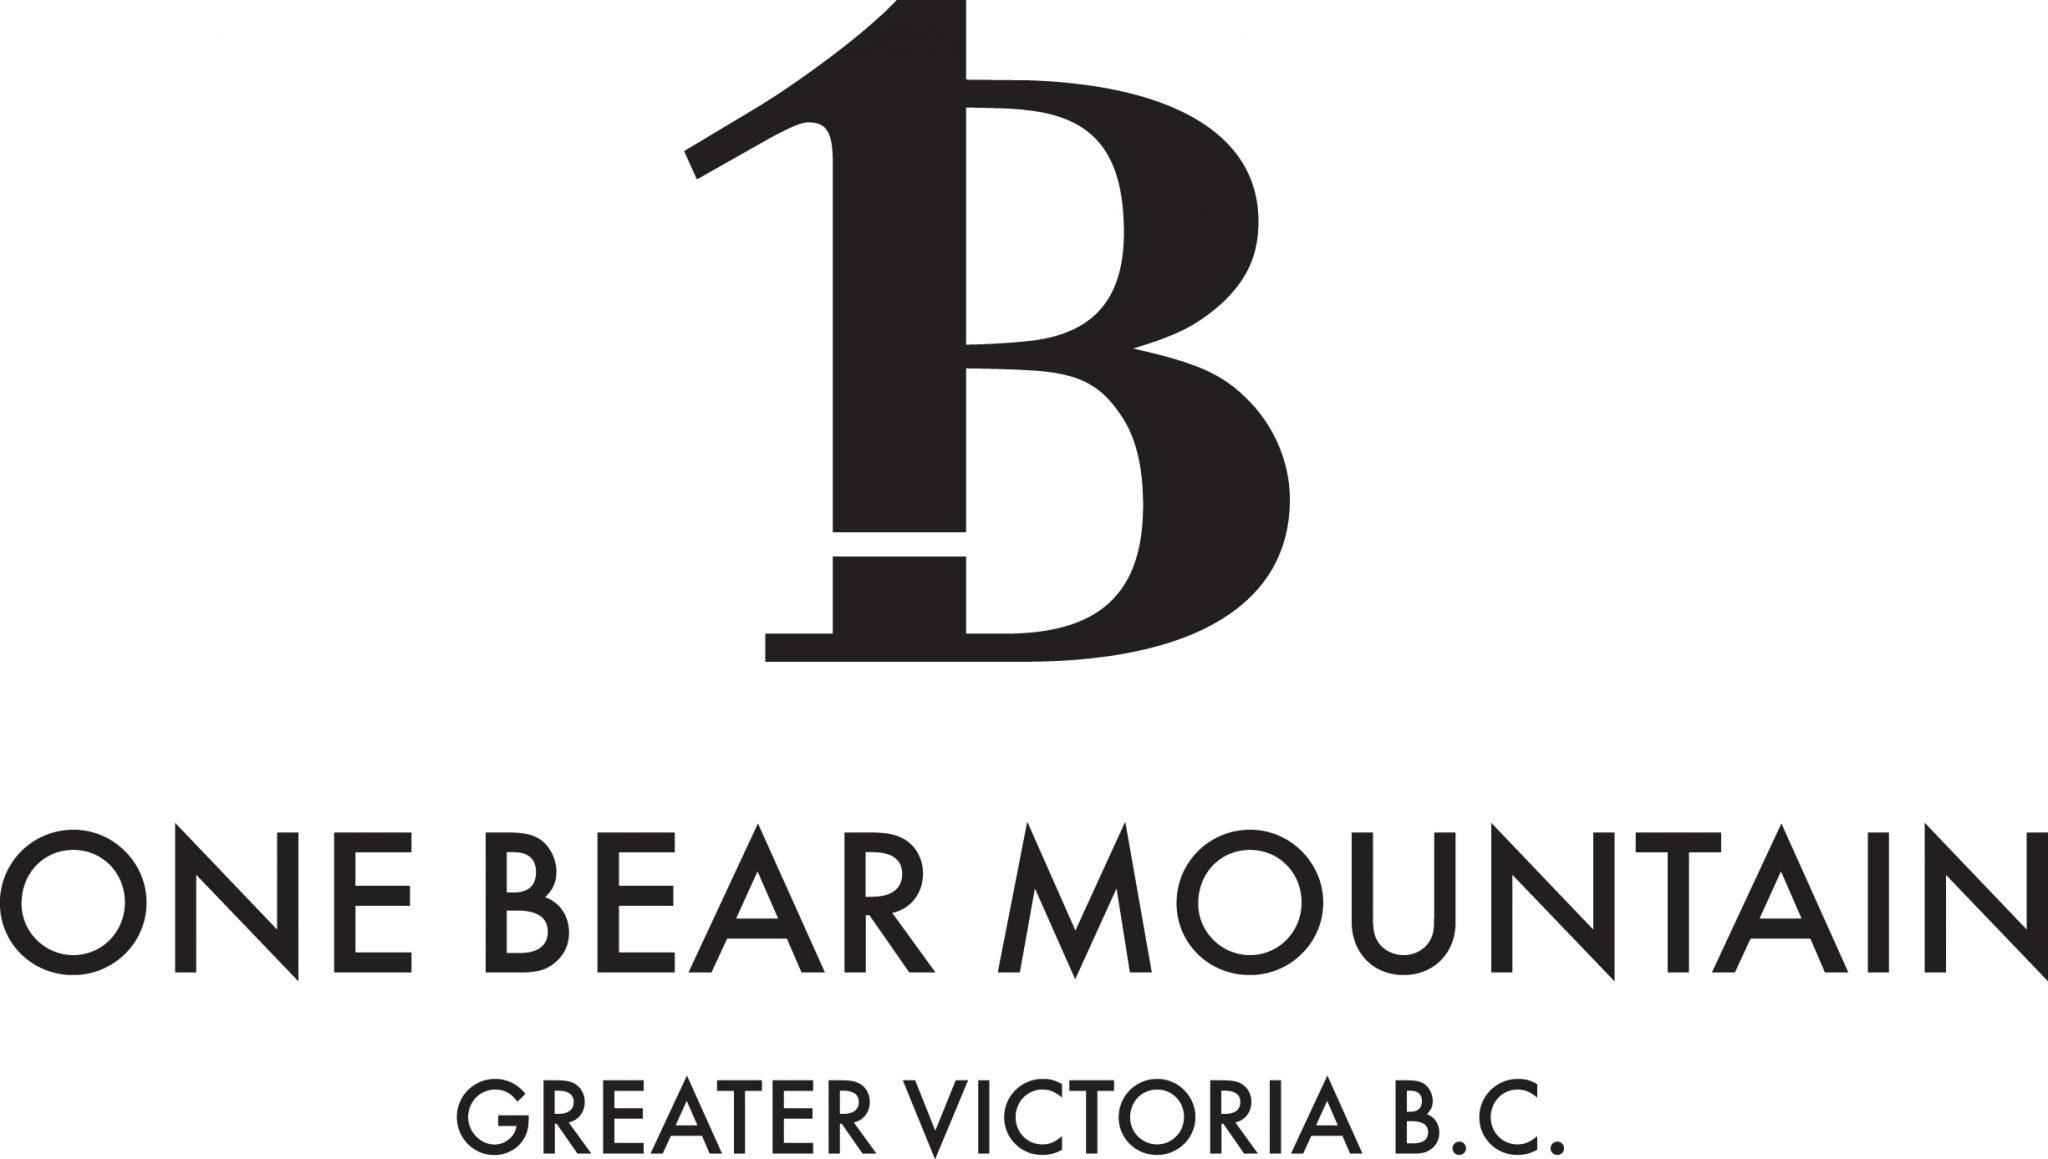 ONE BEAR MOUNTAIN